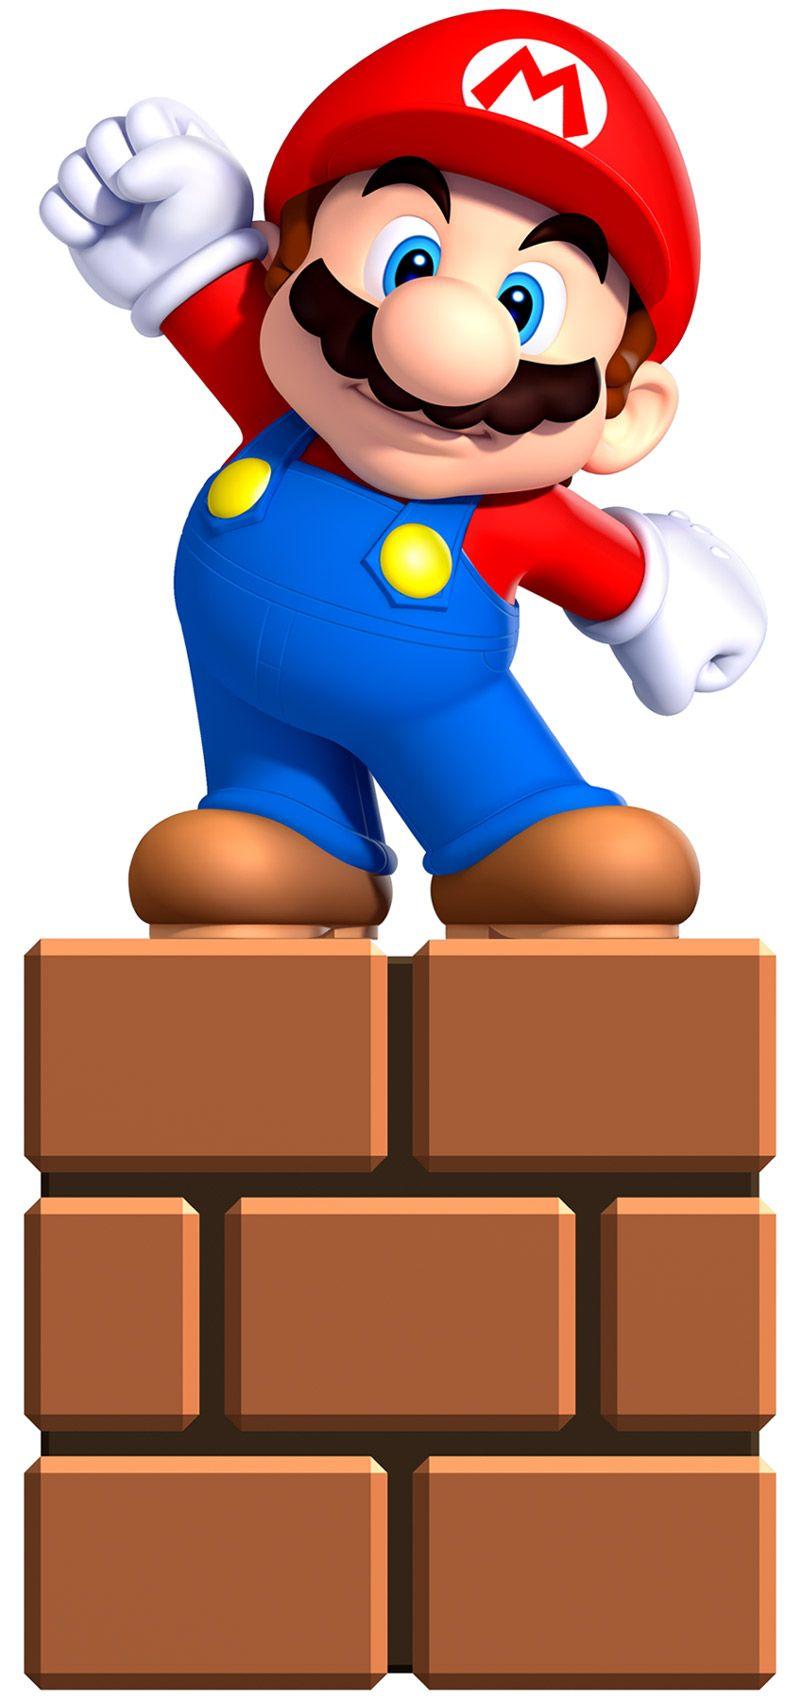 Mini Mario Characters Art New Super Mario Bros U Mini Mario Super Mario Bros Mario Bros